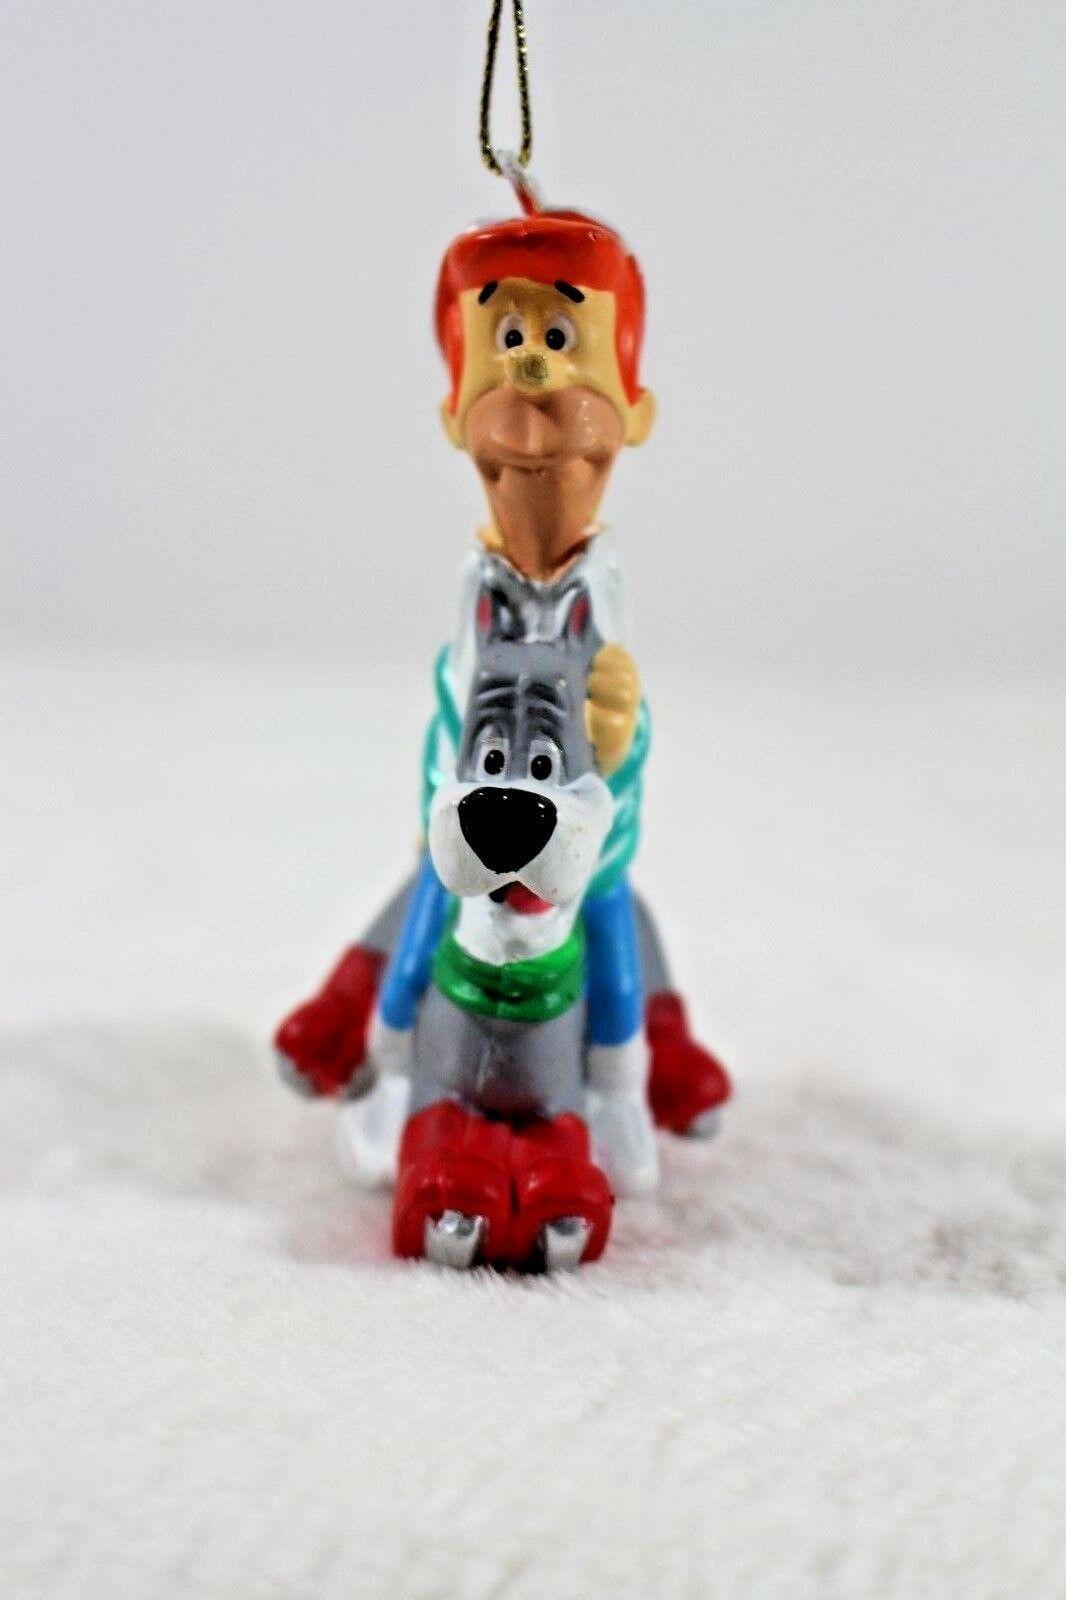 George Jeston Astro Christmas Tree Ornament Hanna Barbera Stocking Stuffer